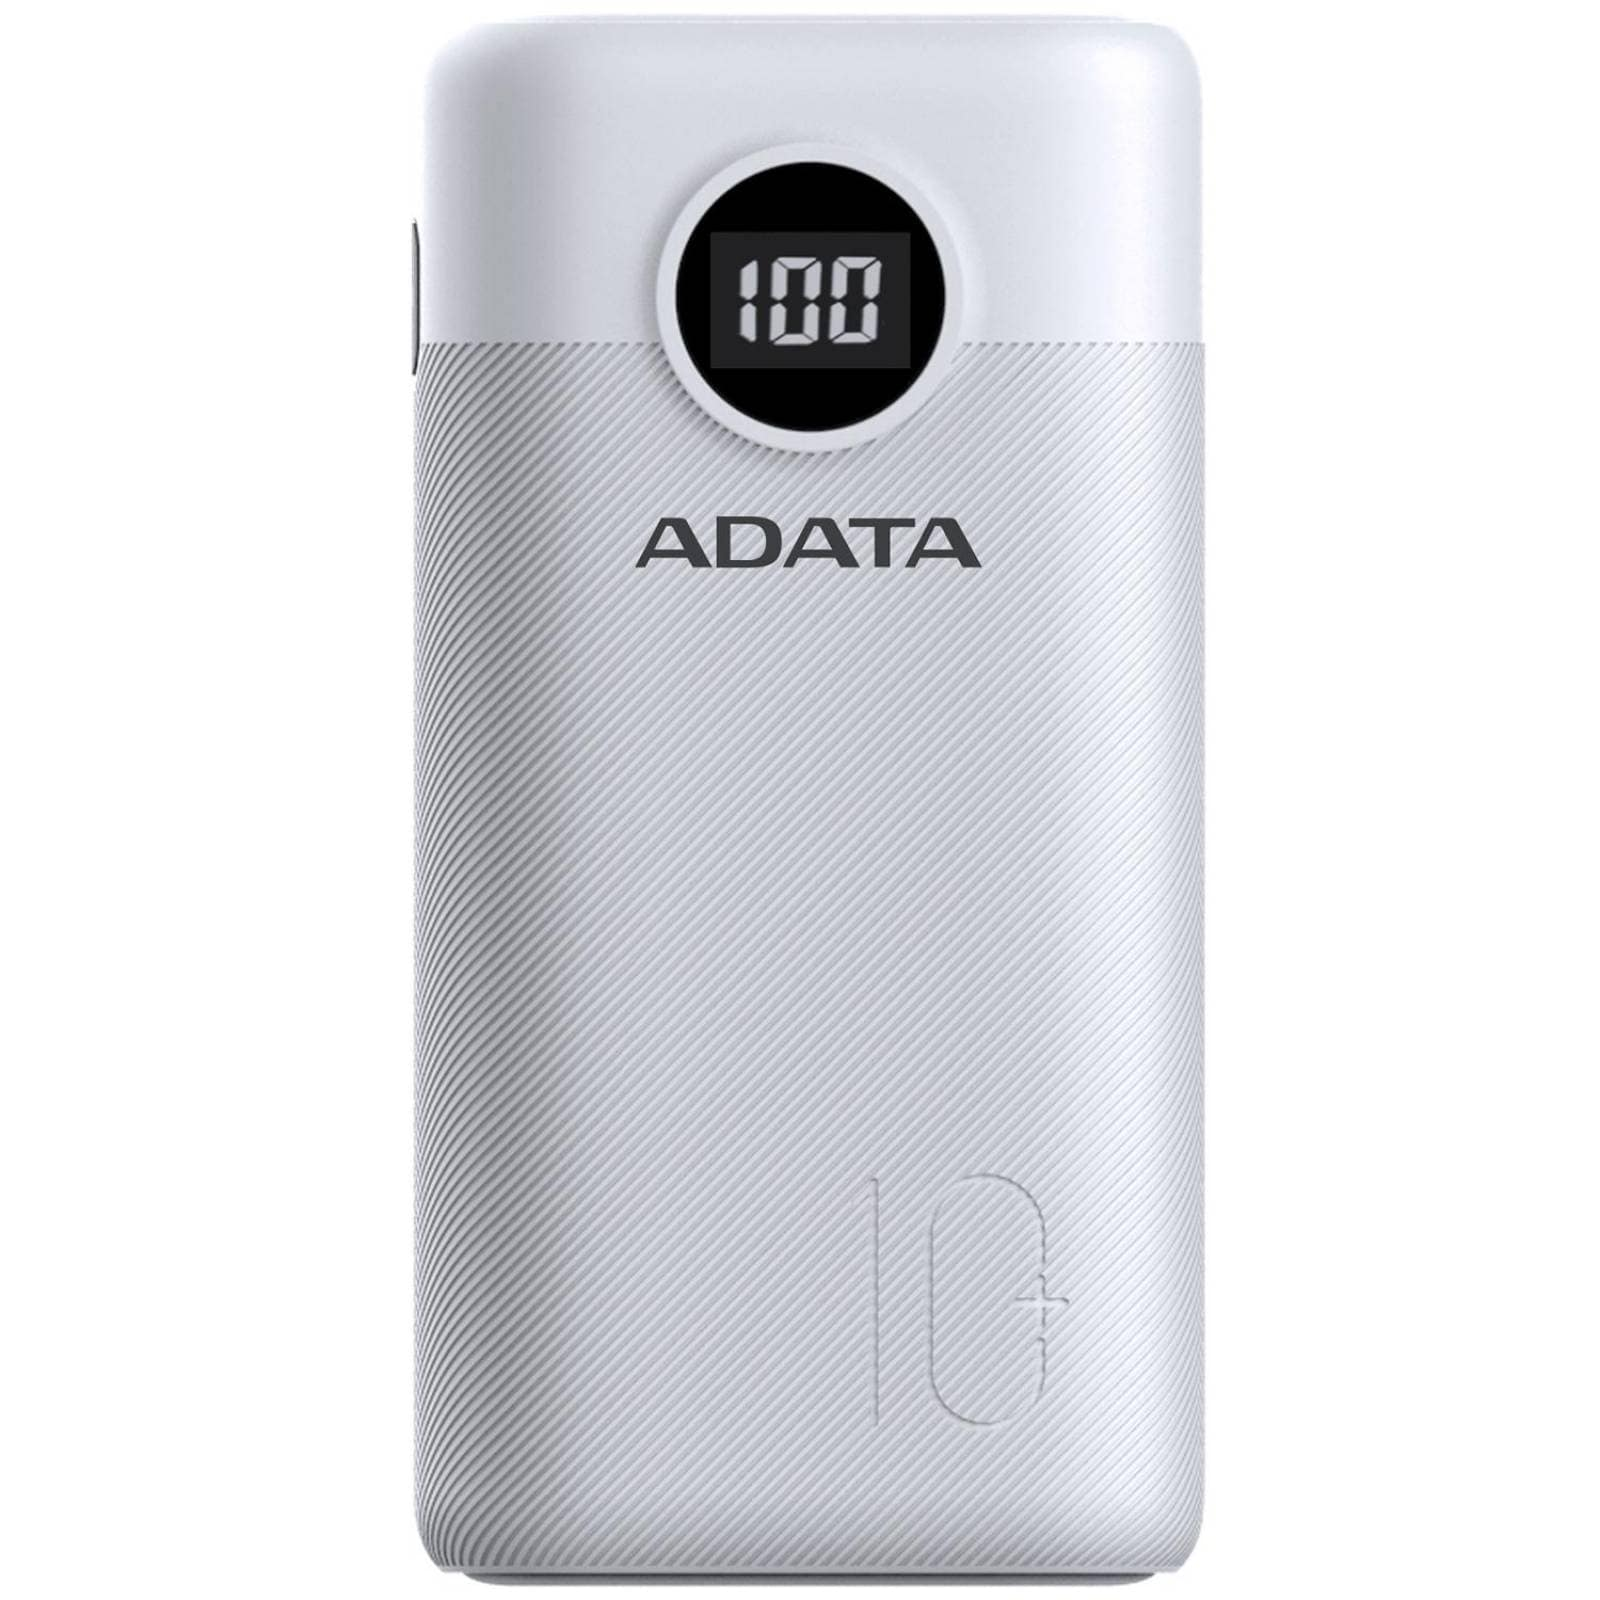 Power Bank 20000MAH ADATA P20000QCD Bateria Portatil Tipo C AP20000QCD-DGT-CWH